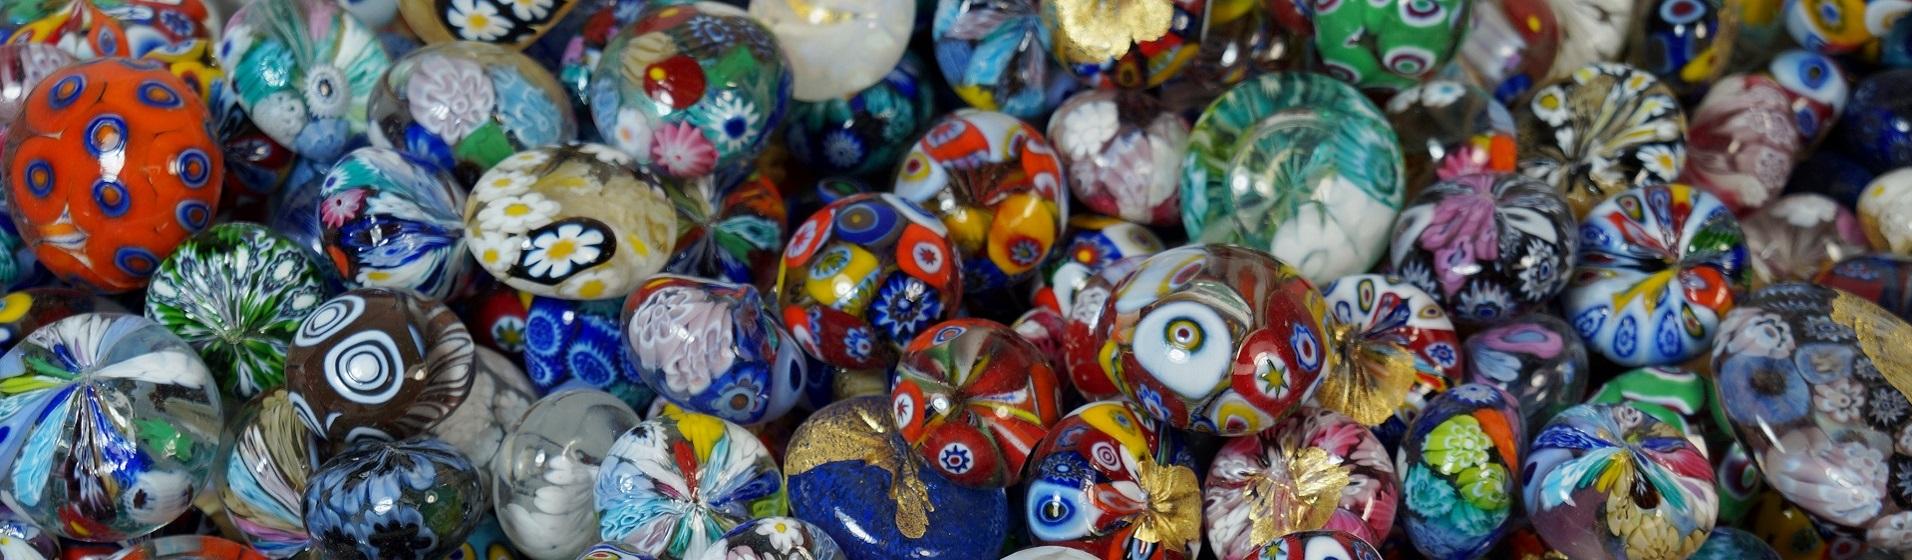 Murano, the glass island